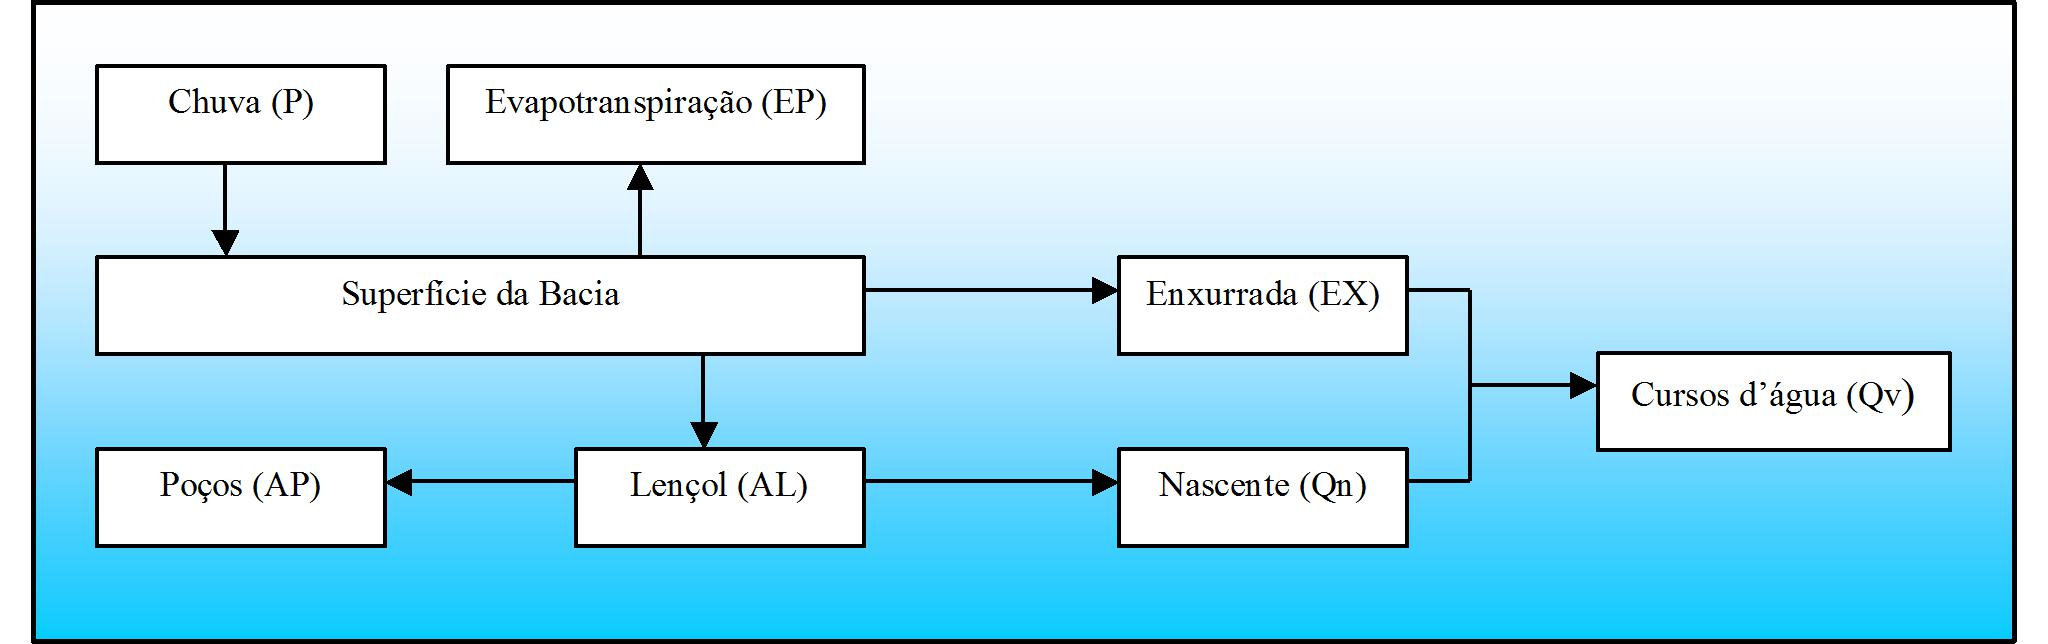 UTI ambiental: diagnóstico da água III - Figura 1